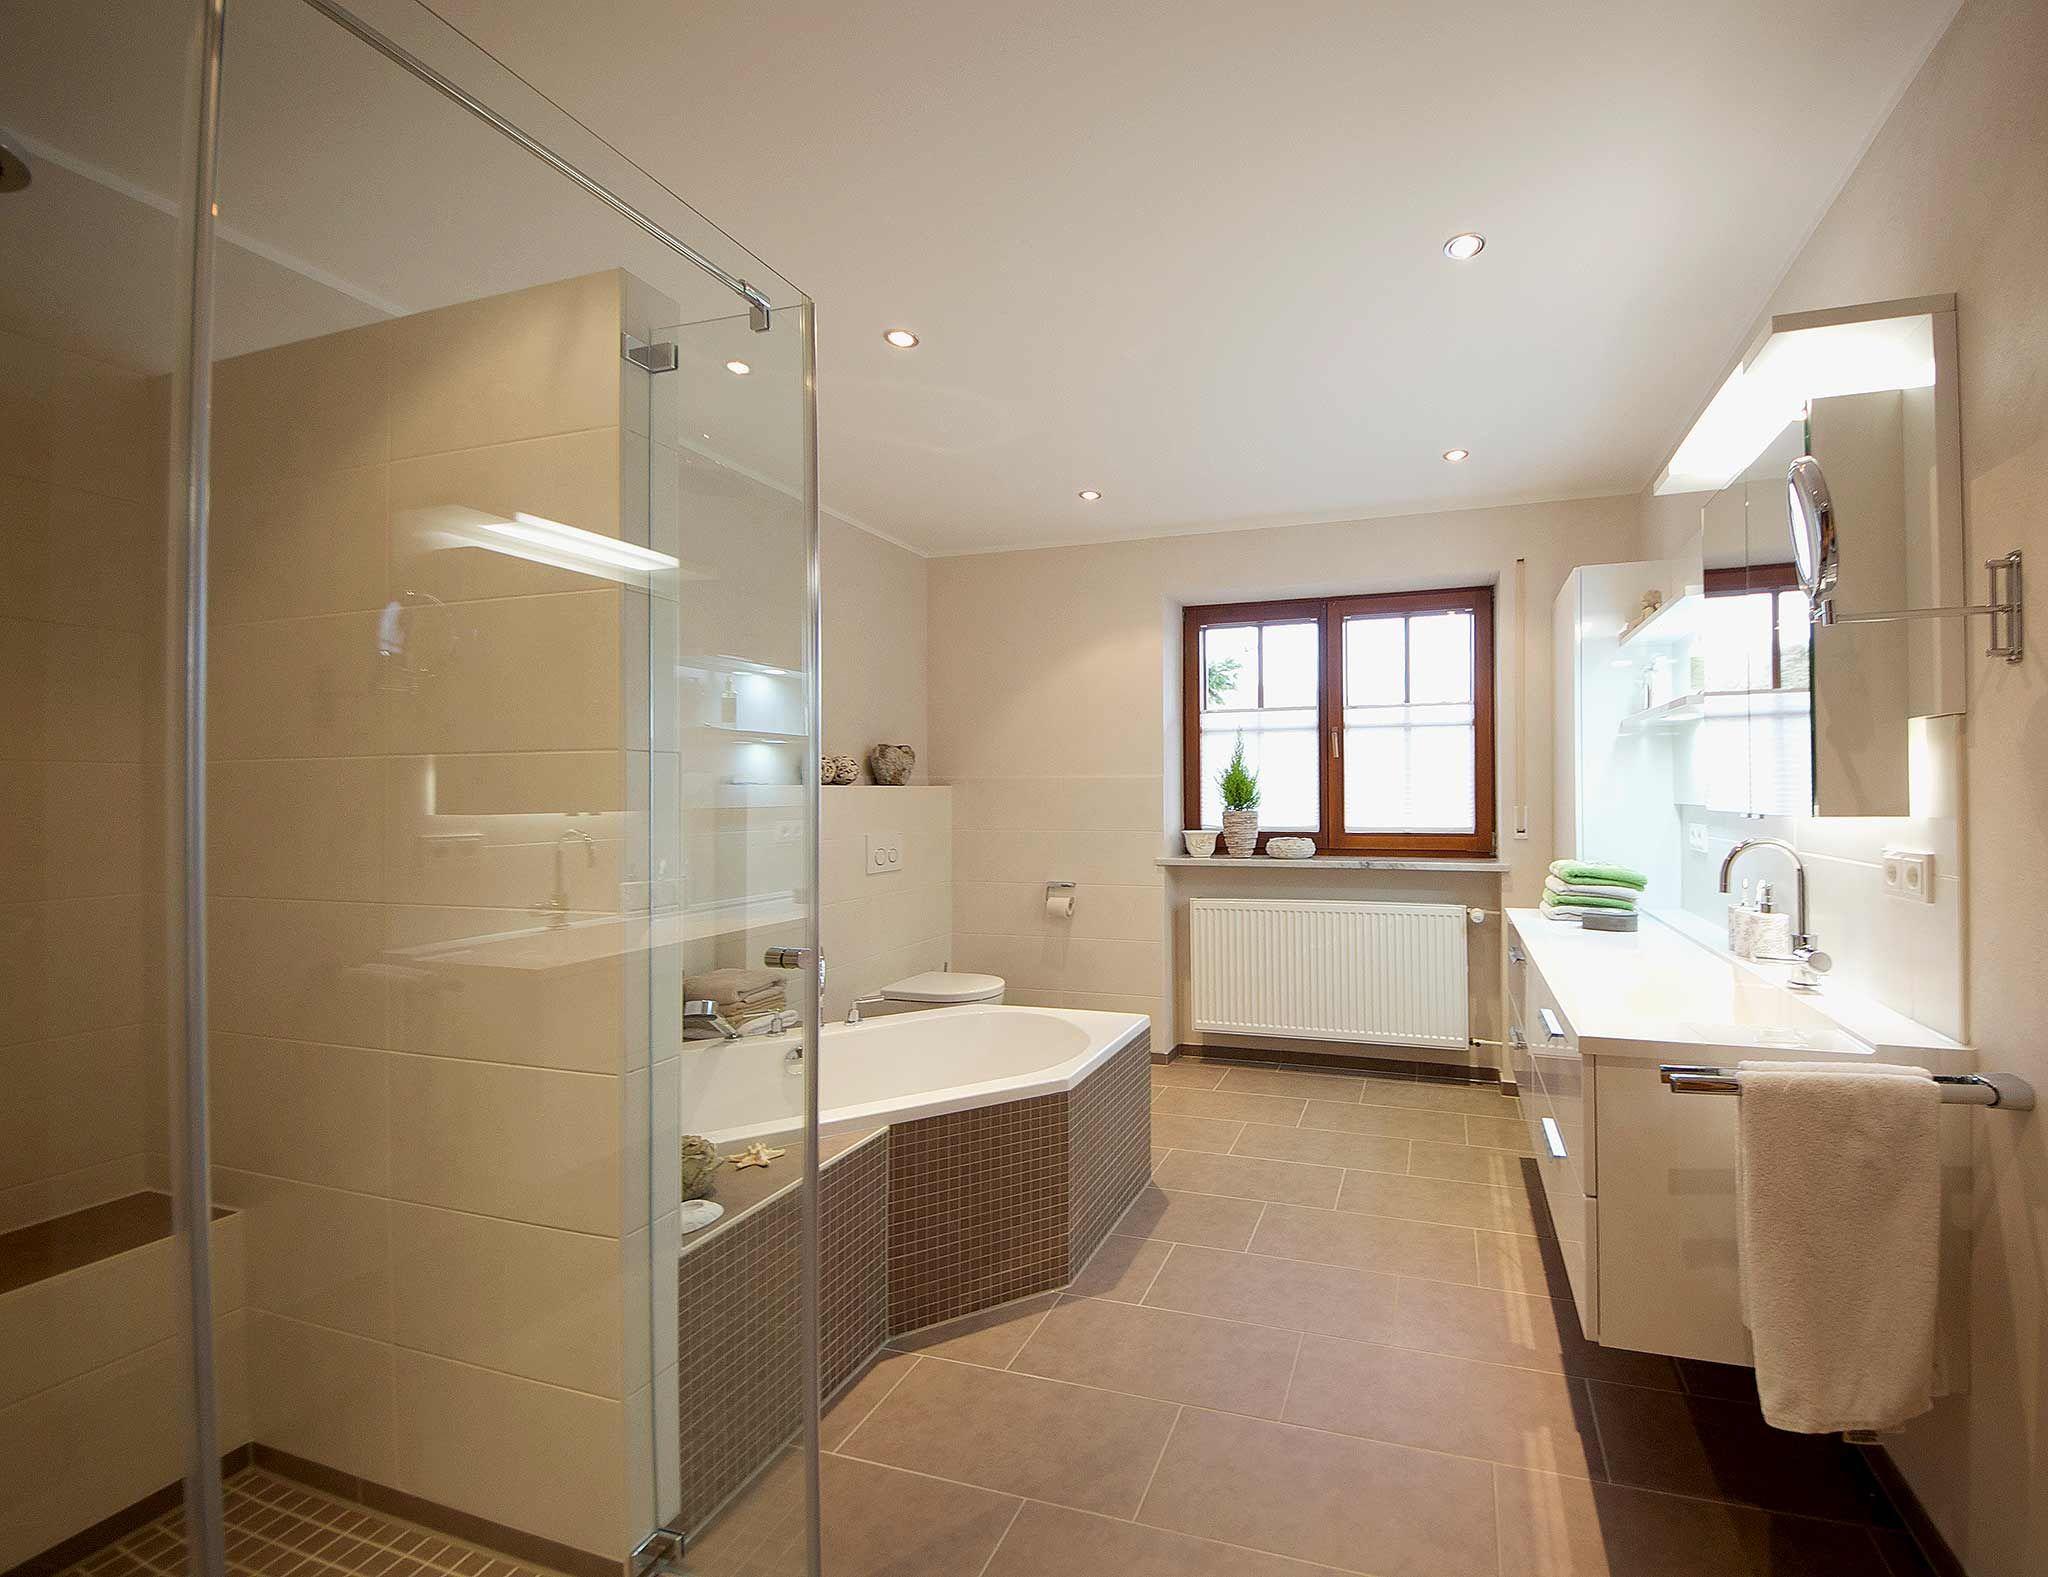 Wandgestaltung Badezimmer ~ Blick ins badezimmer graubraune bodenfliesen helle